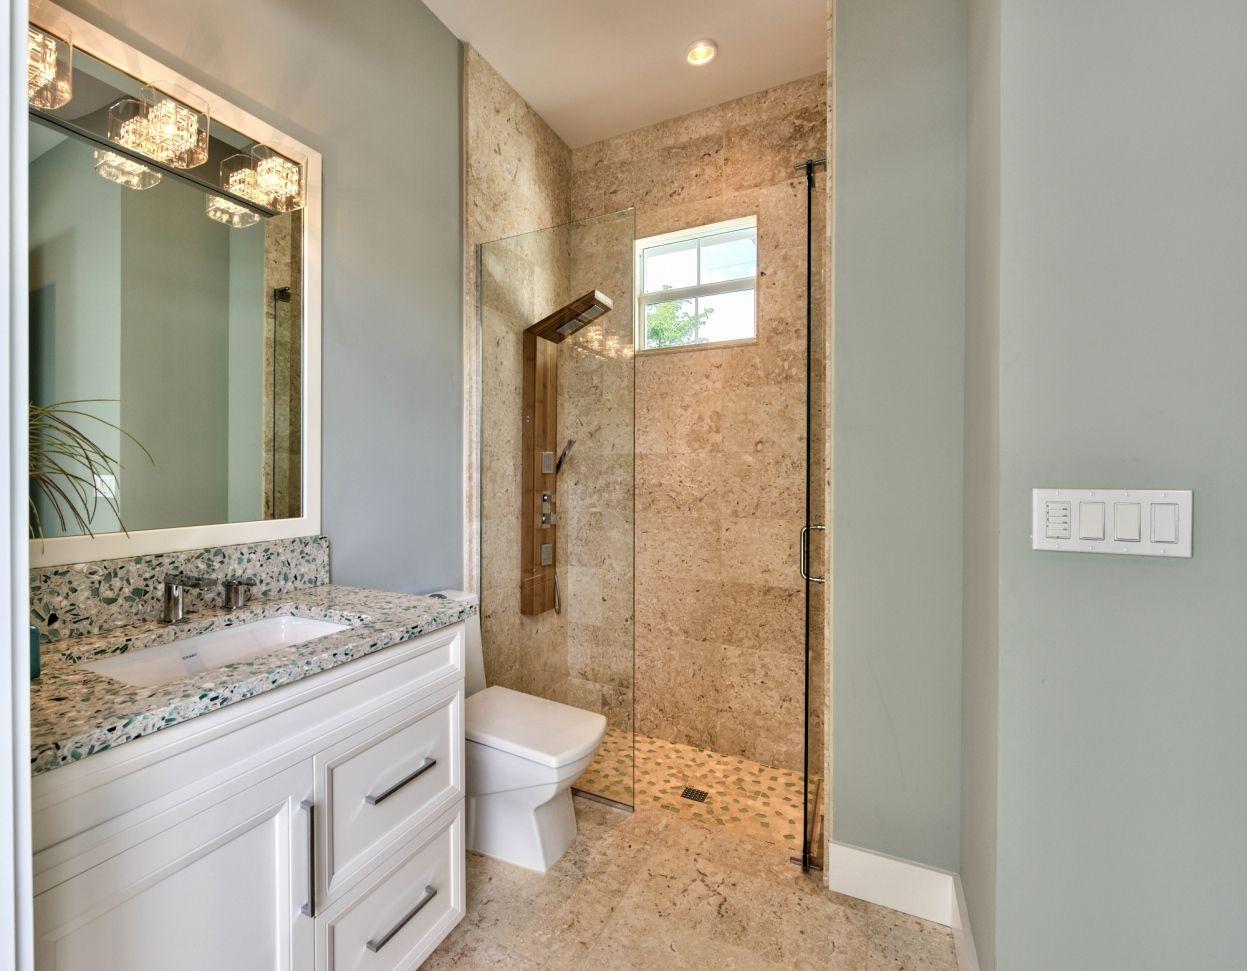 Bathroom Remodel Naples Fl Neutral Interior Paint Colors Check - Bathroom remodeling naples fl